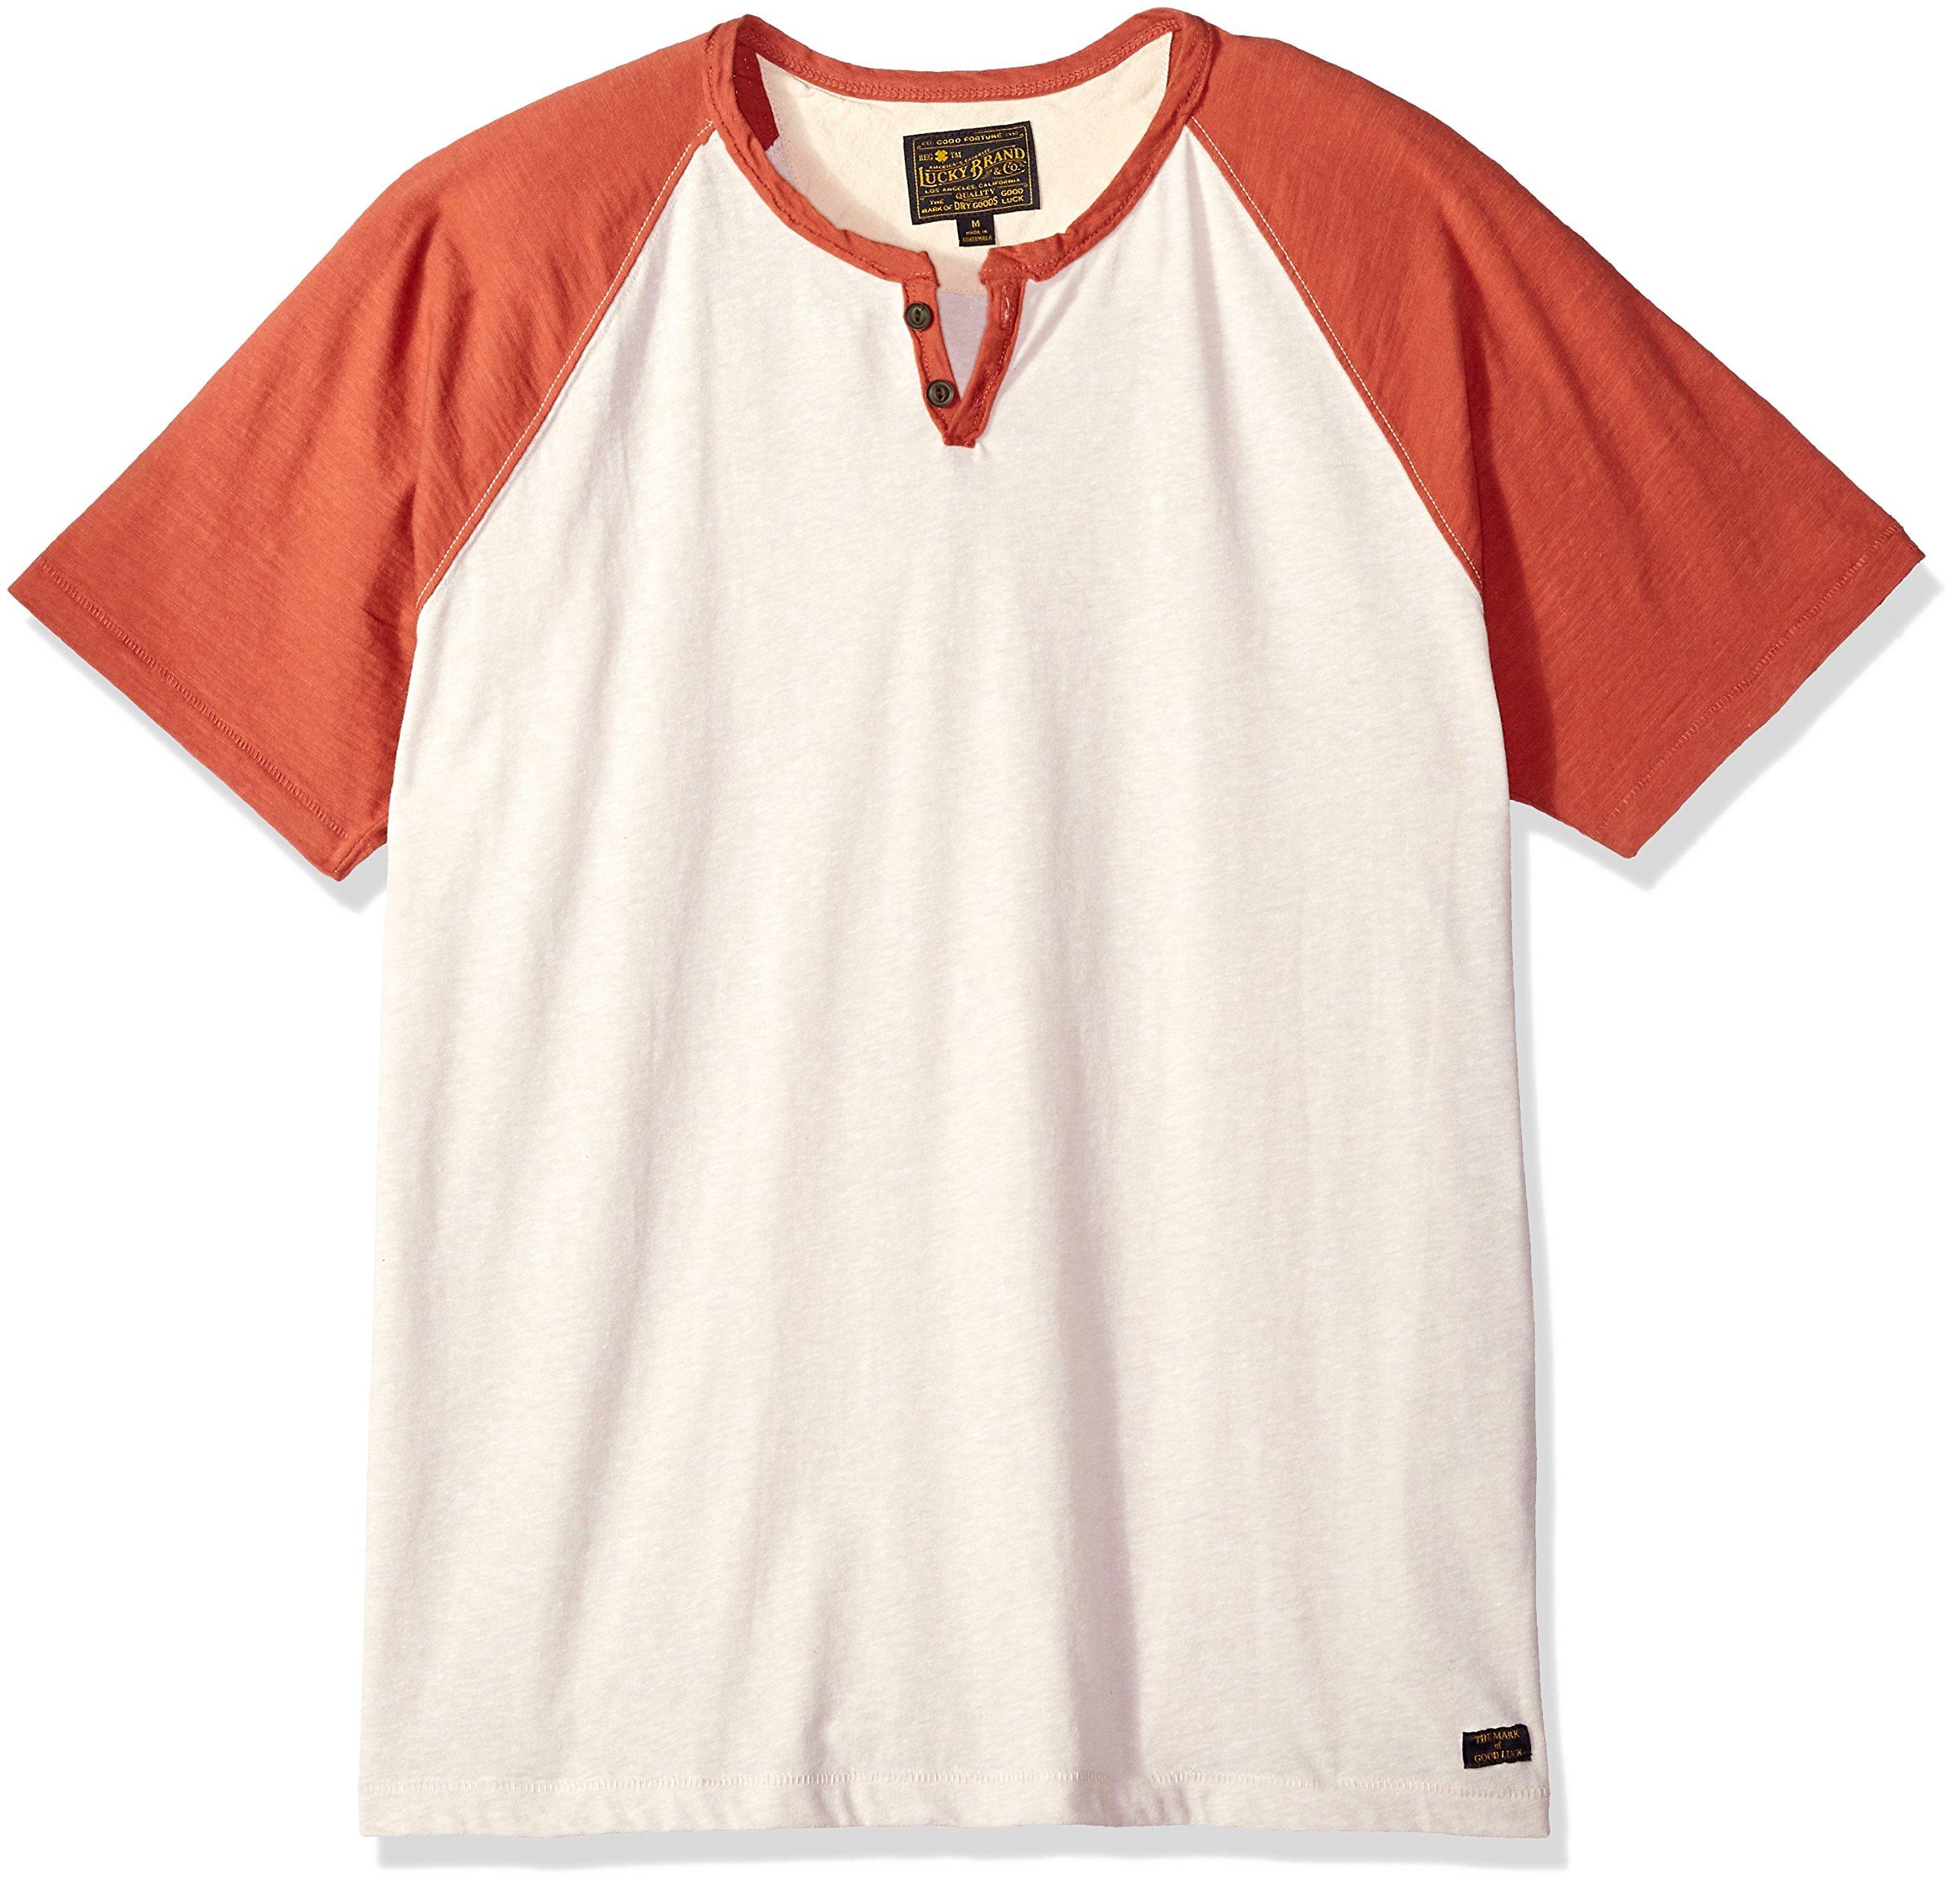 Lucky Brand Men's Colorblock Henley Shirt, Heather Oat Body/Red Sleeve, M